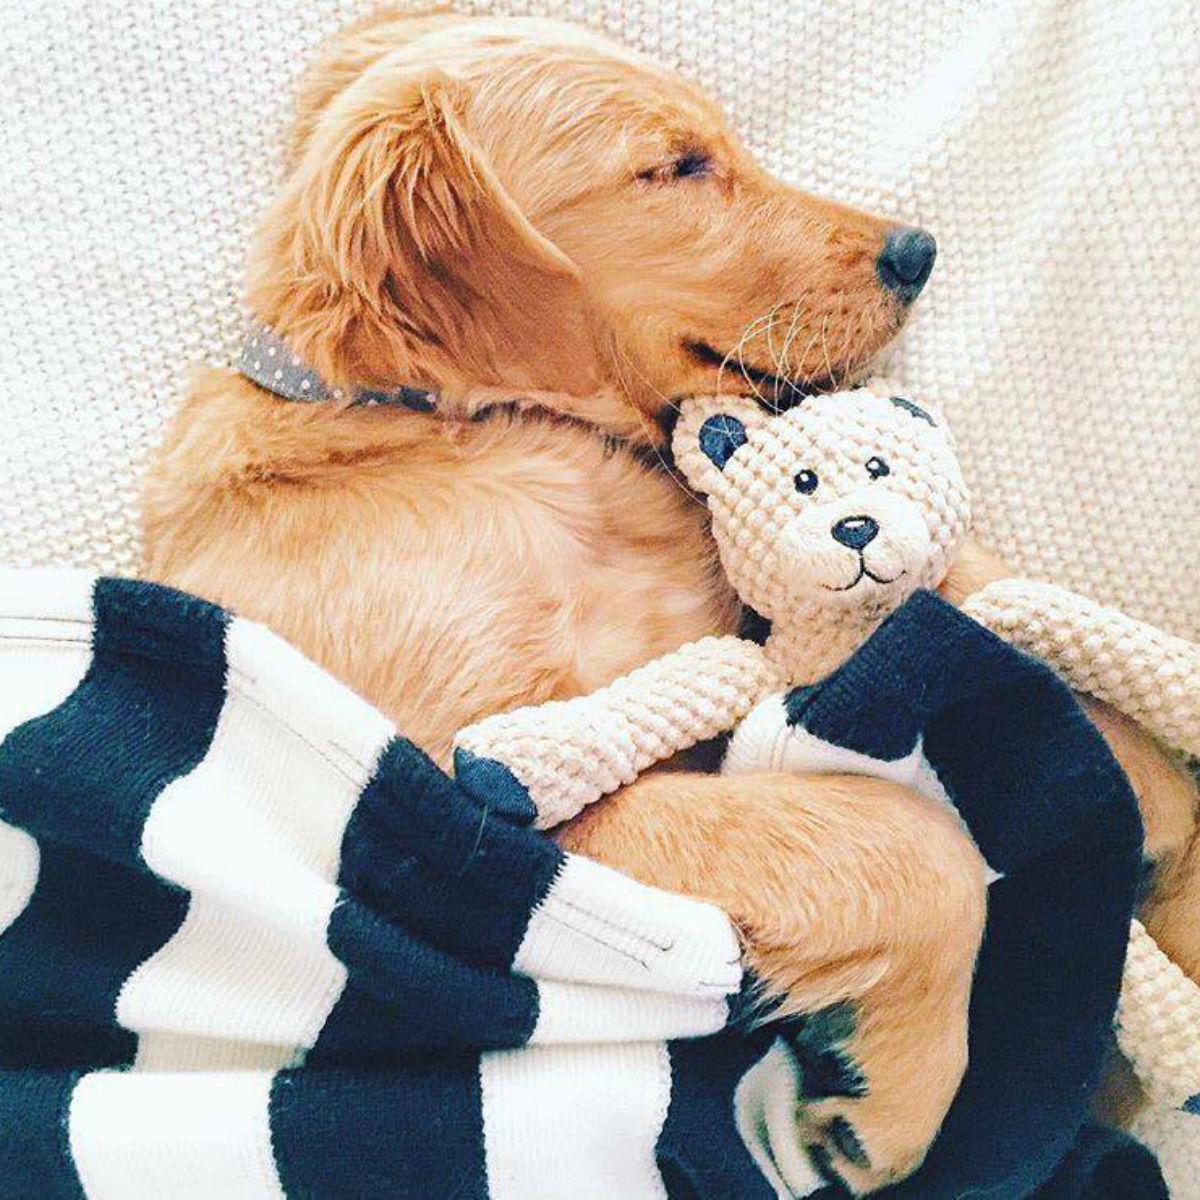 fabdog® Floppy Friends Dog Toy - Gray Teddy Bear